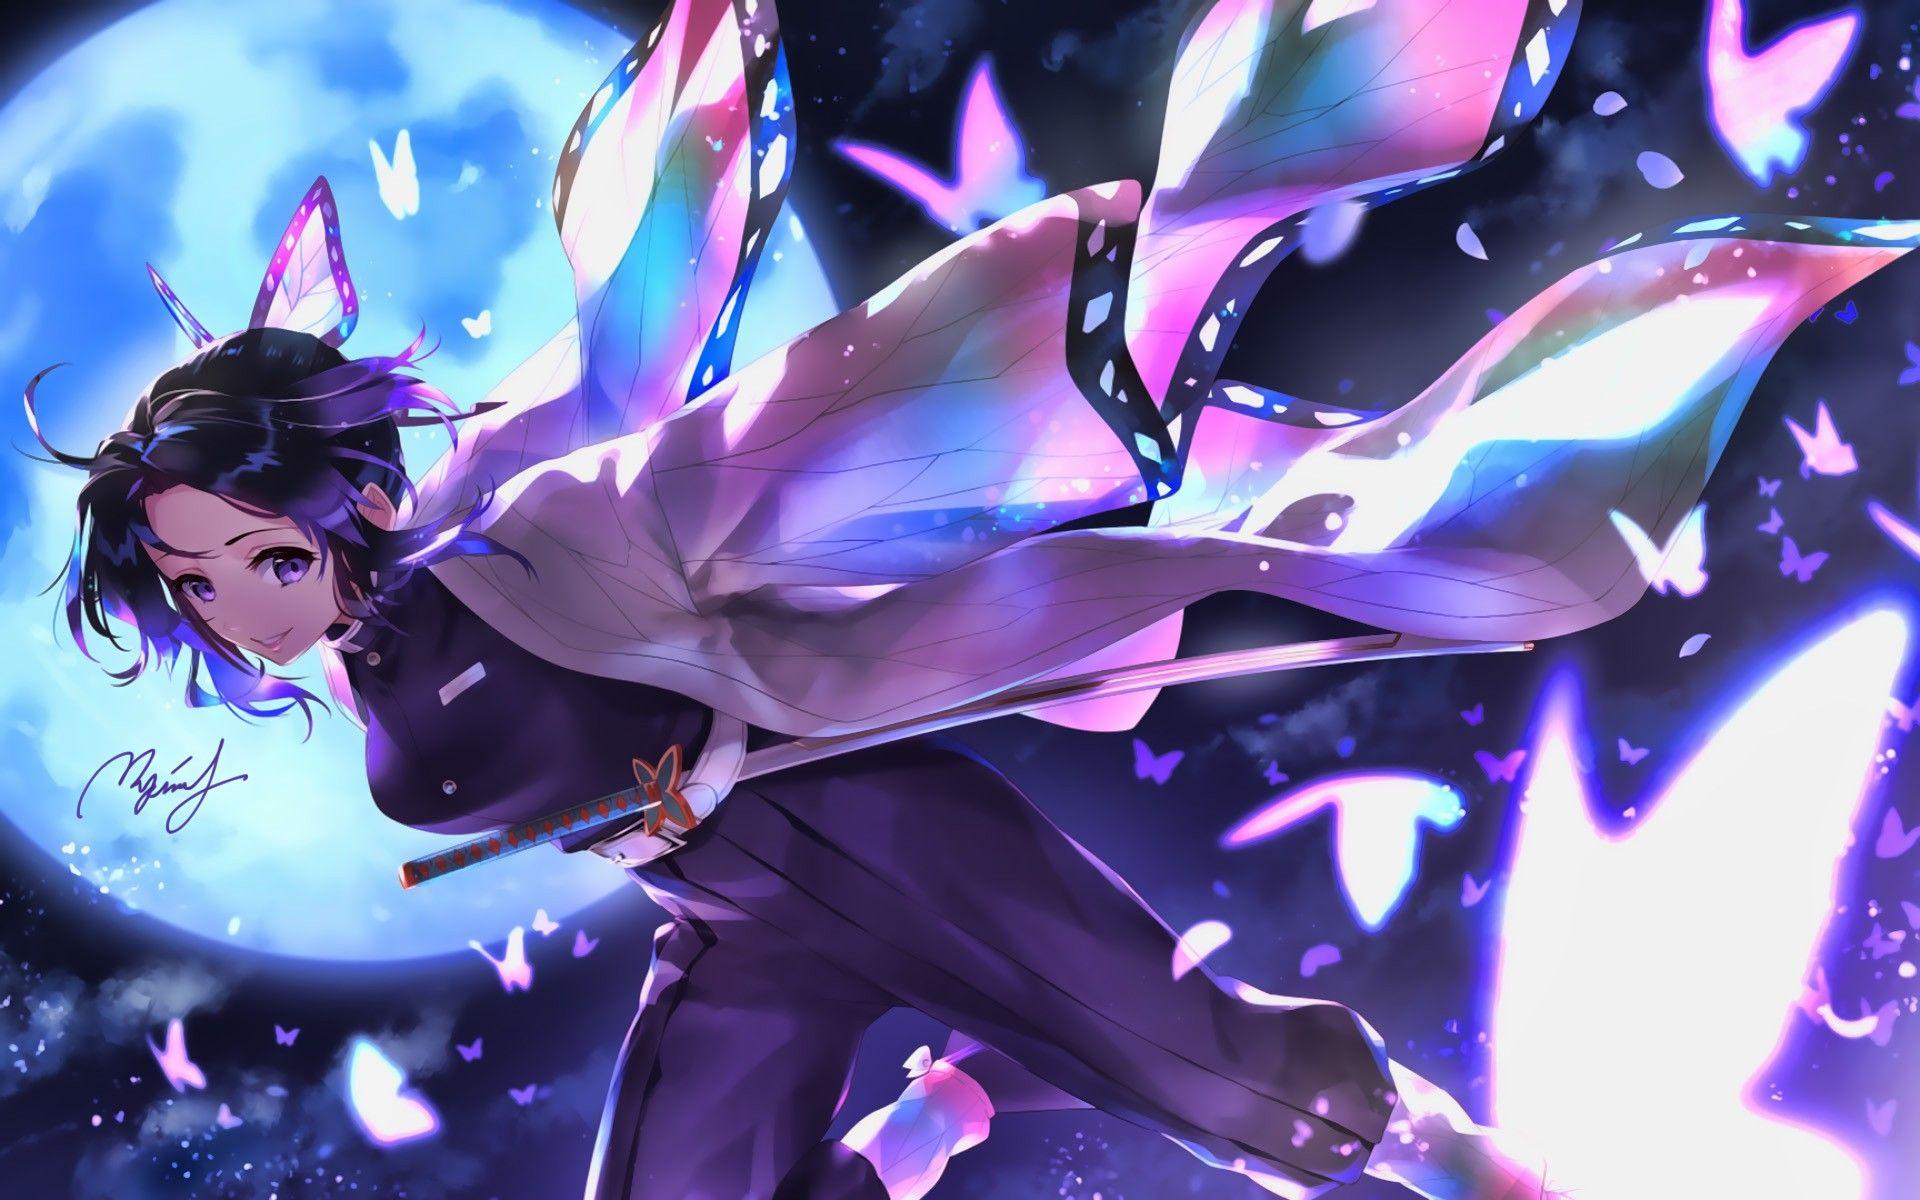 Descargar Fondos De Pantalla Shinobu Kochou Obras De Arte Kimetsu No Yaiba Diablo Cazador Buscar Kimono Mariposas Kocho Shinobu Besthqwallpapers Com Anime Anime Fantasy Anime Demon Descargar wallpaper de anime